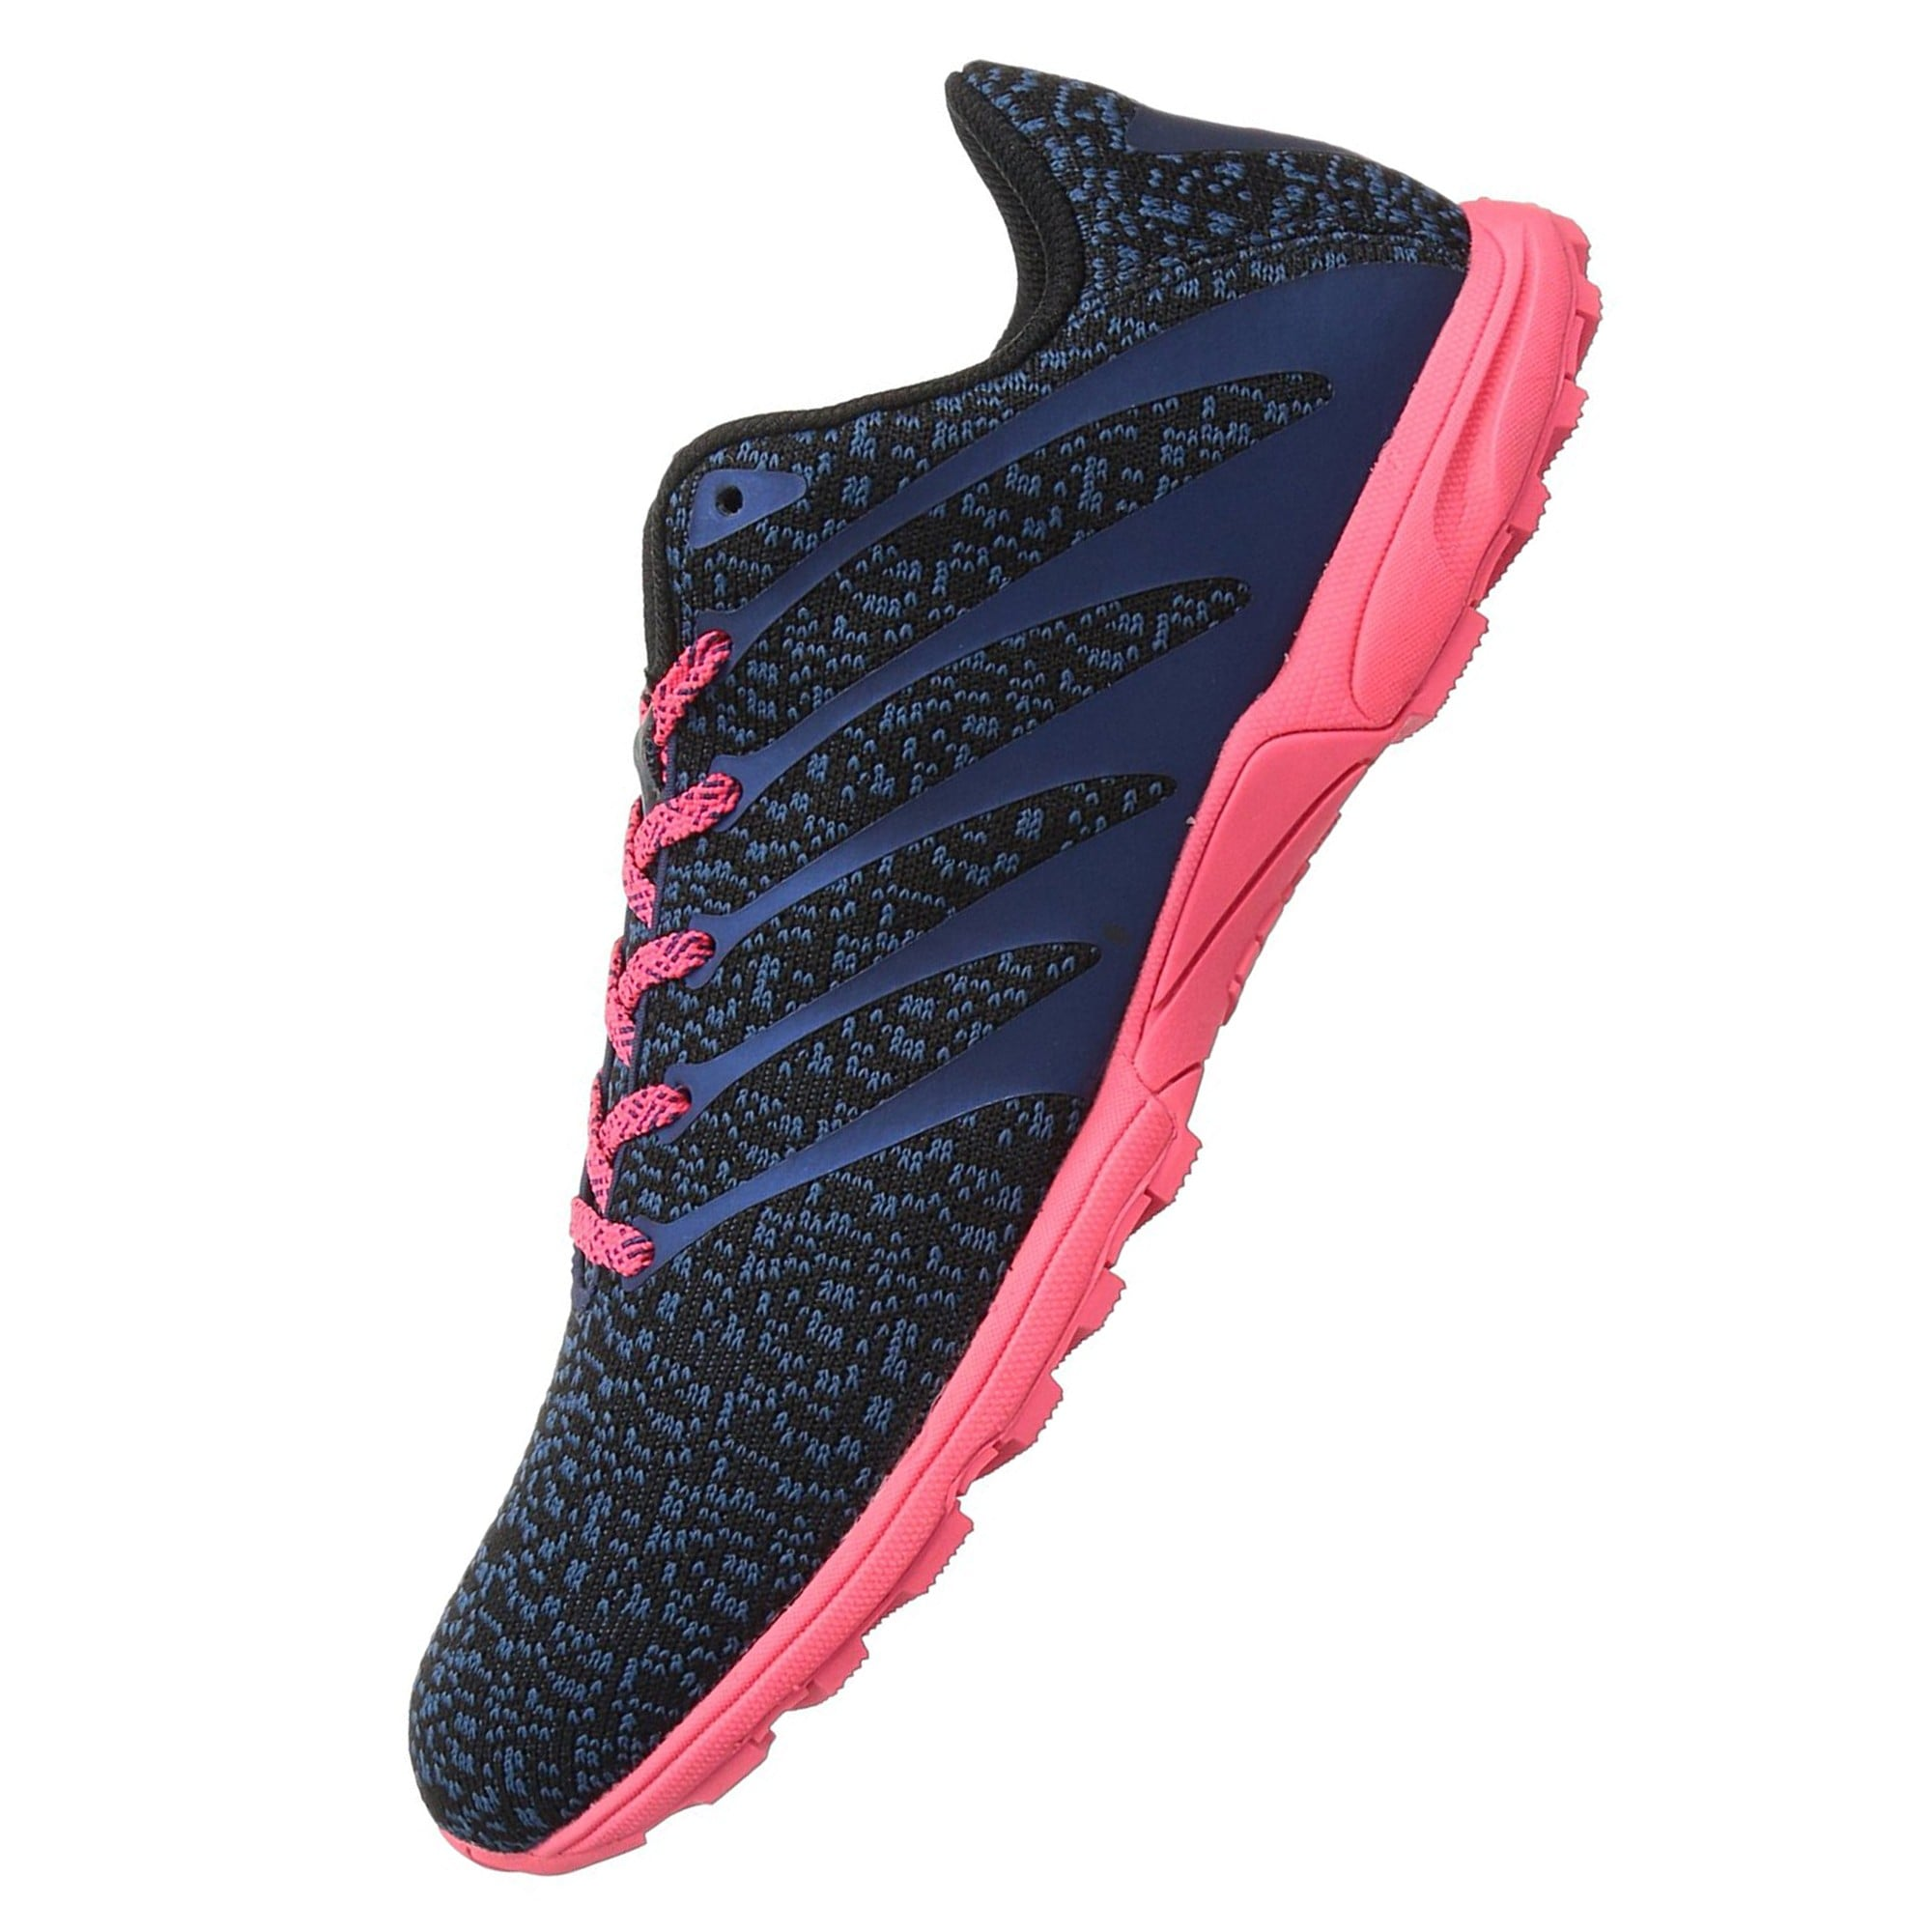 Cheap Workout Shoes on Amazon